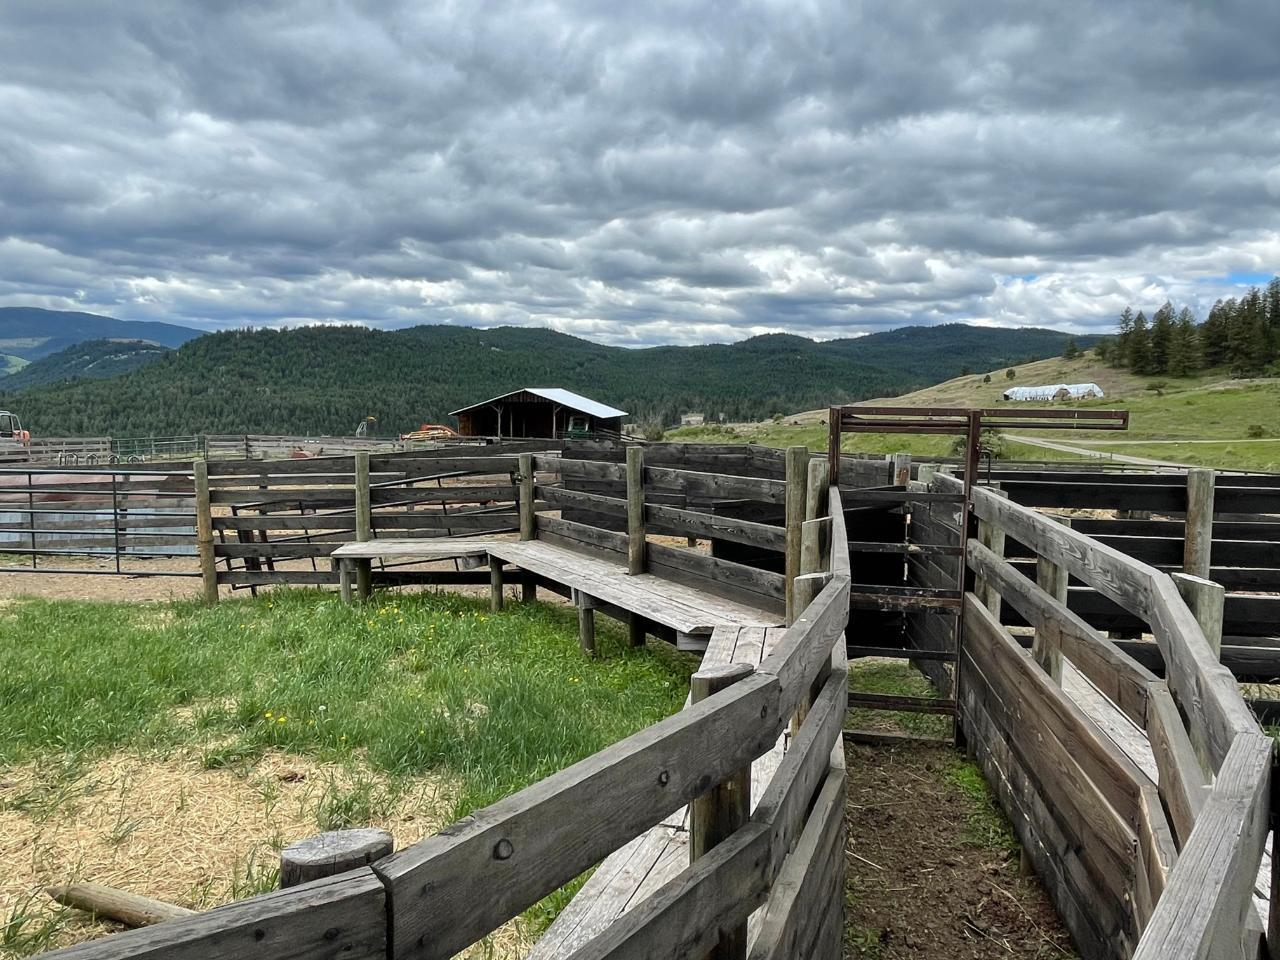 4685 Hwy 3,, Rock Creek/bridesville, British Columbia  V0H 1Y0 - Photo 11 - 189734